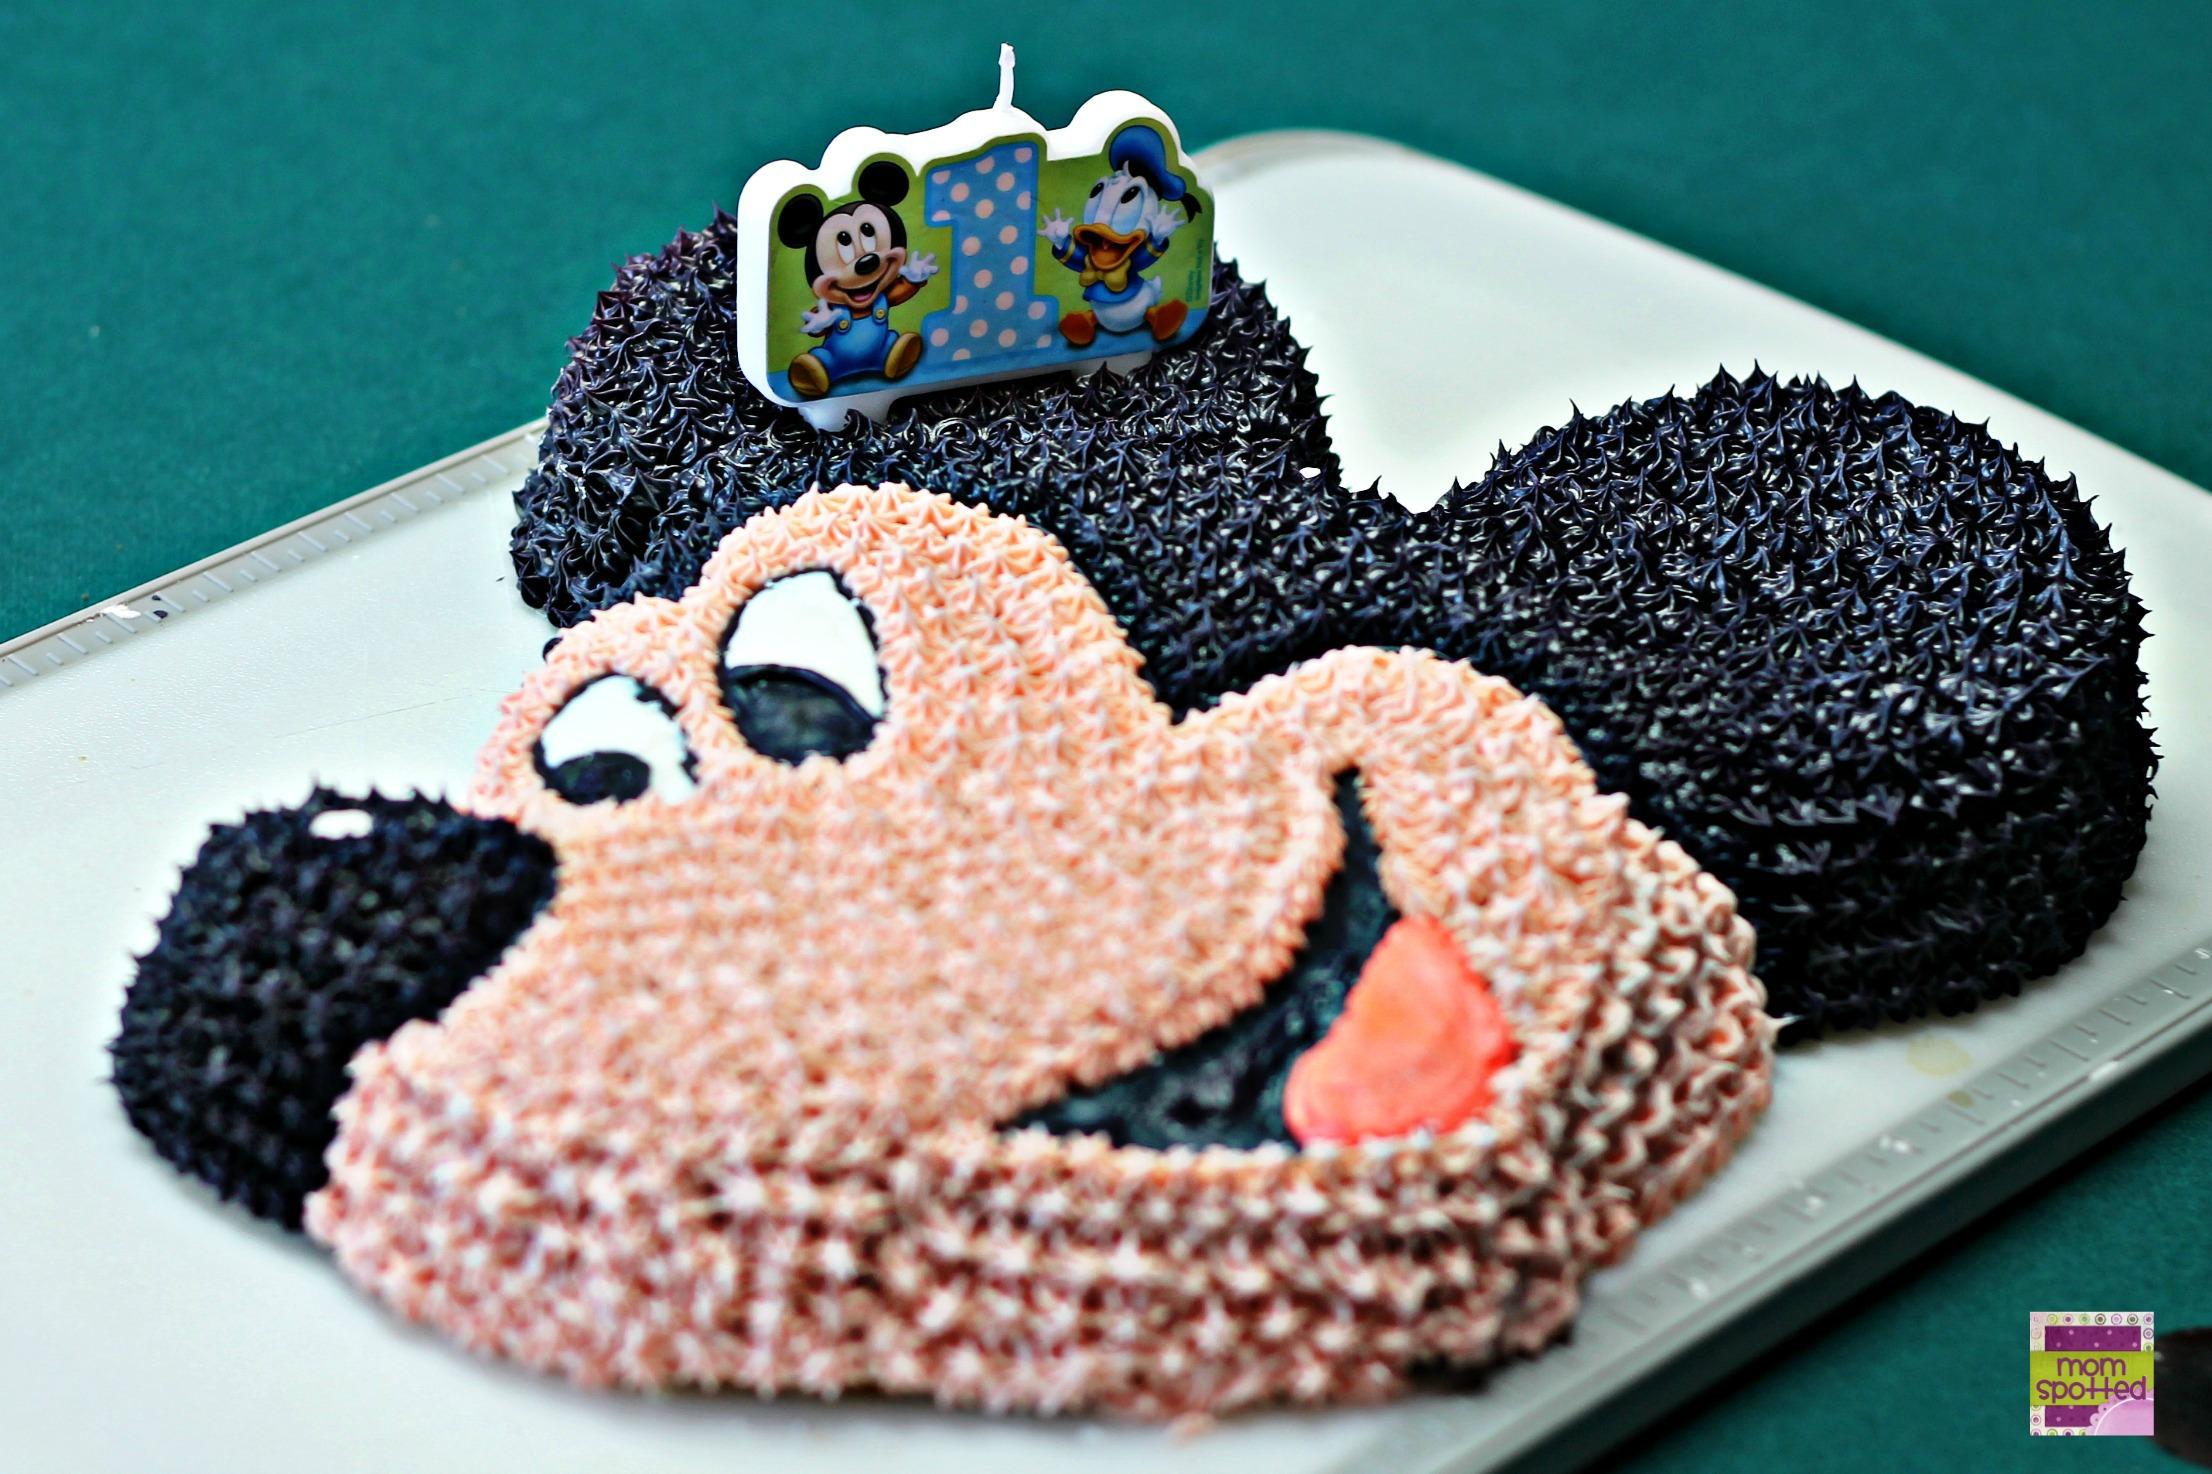 Wondrous Disney Mickey Mouse Clubhouse Birthday Cake Tutorial Funny Birthday Cards Online Elaedamsfinfo